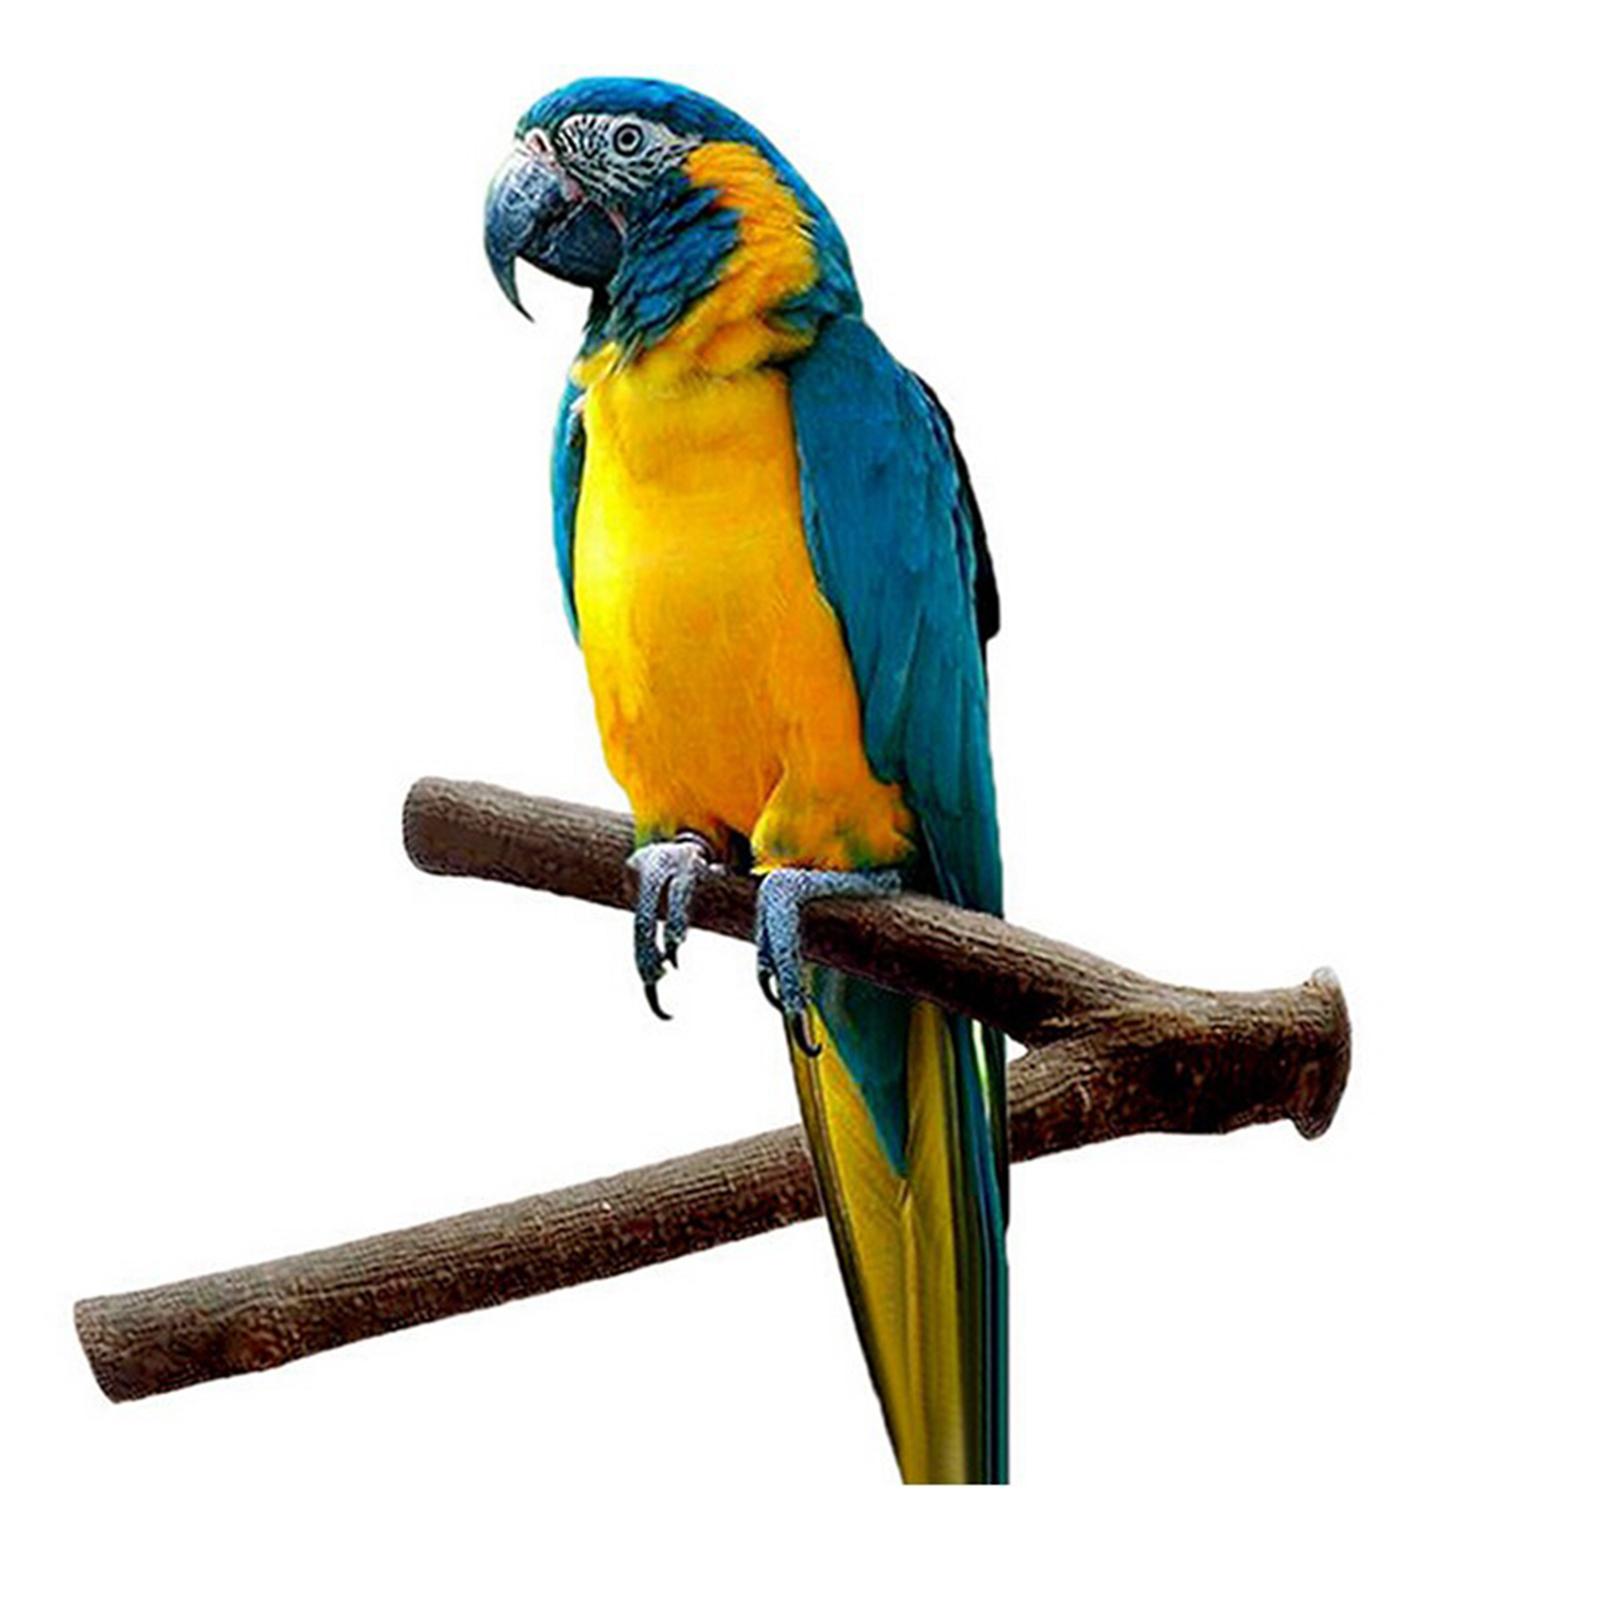 thumbnail 16 - Bird-Perch-Wood-Stand-Bird-Cage-Swing-Branch-for-Parrot-Parakeet-Cockatiel